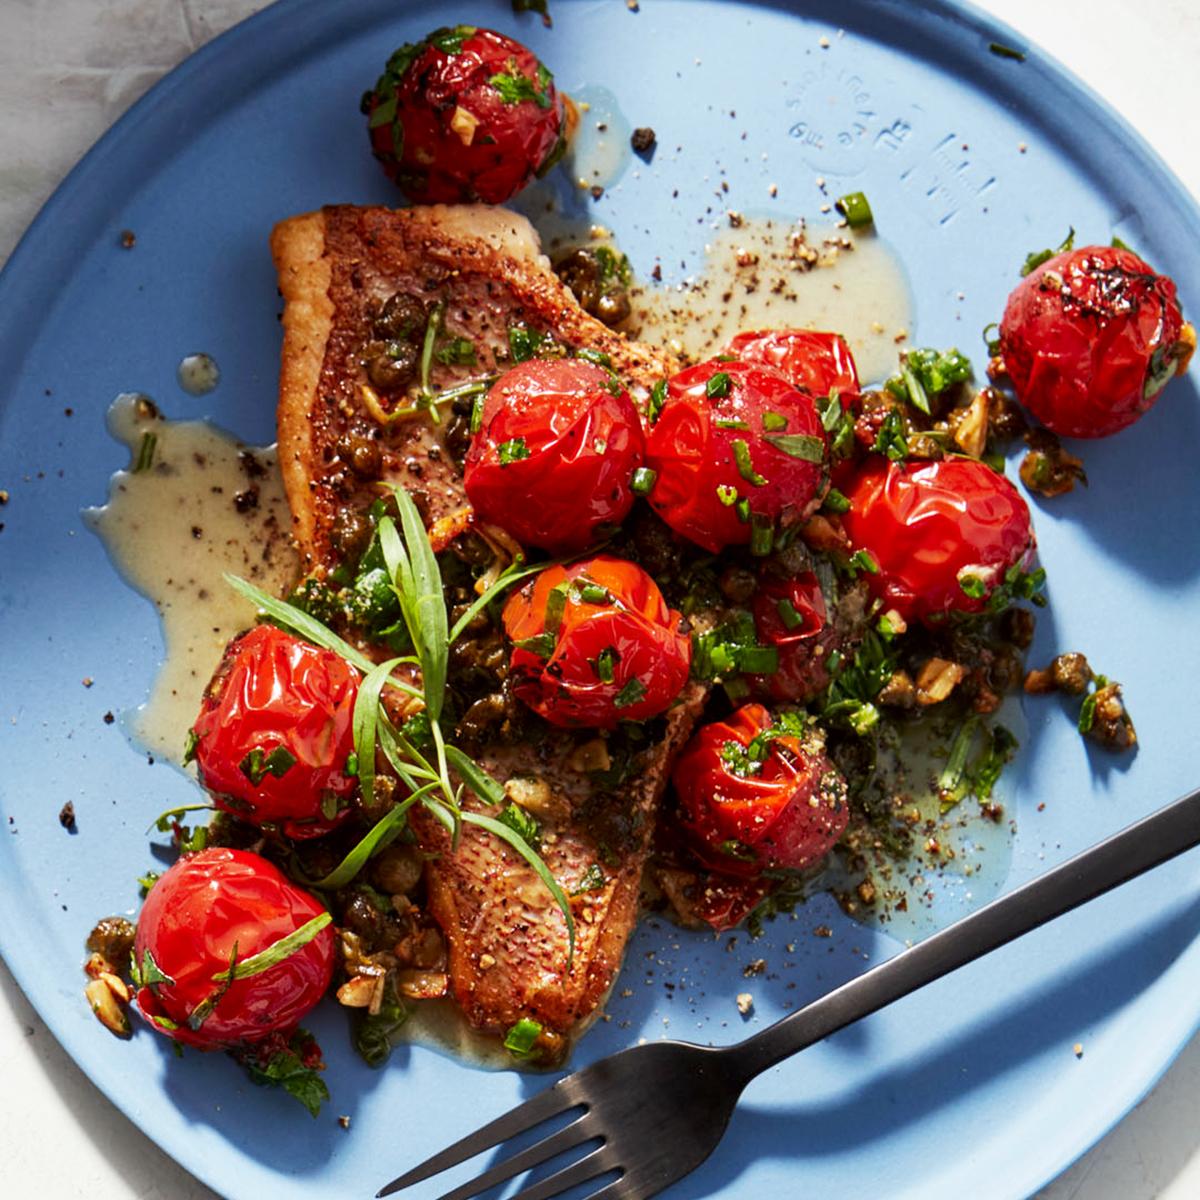 Crispy-Skin Fish with Roasted Cherry Tomato Sauce